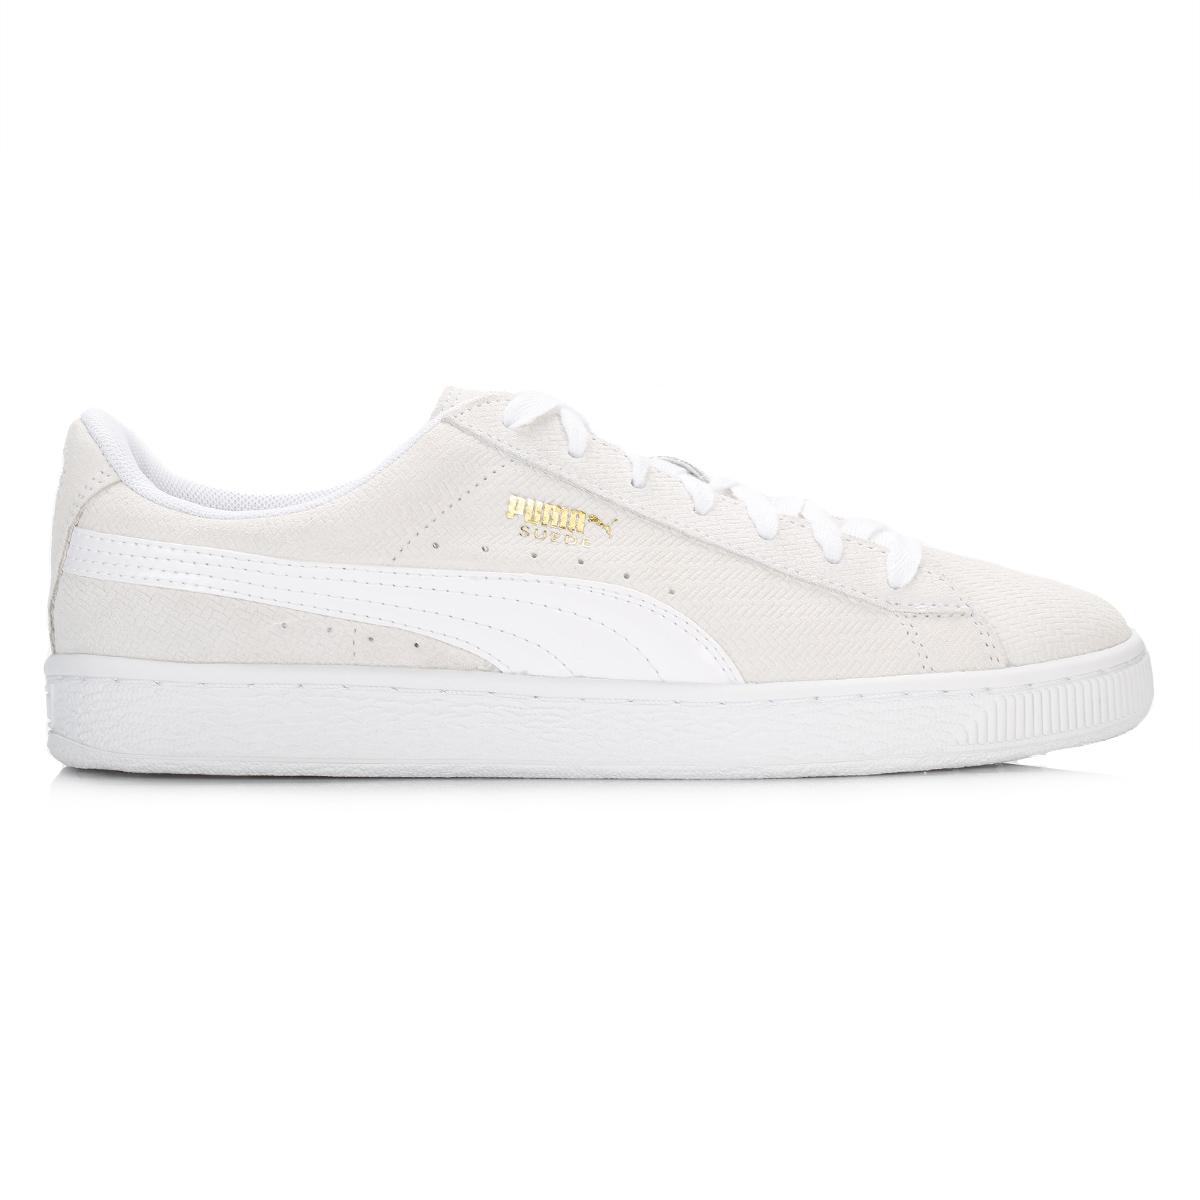 Puma-Womens-Cream-White-Suede-Trainers-Classic-Sport-